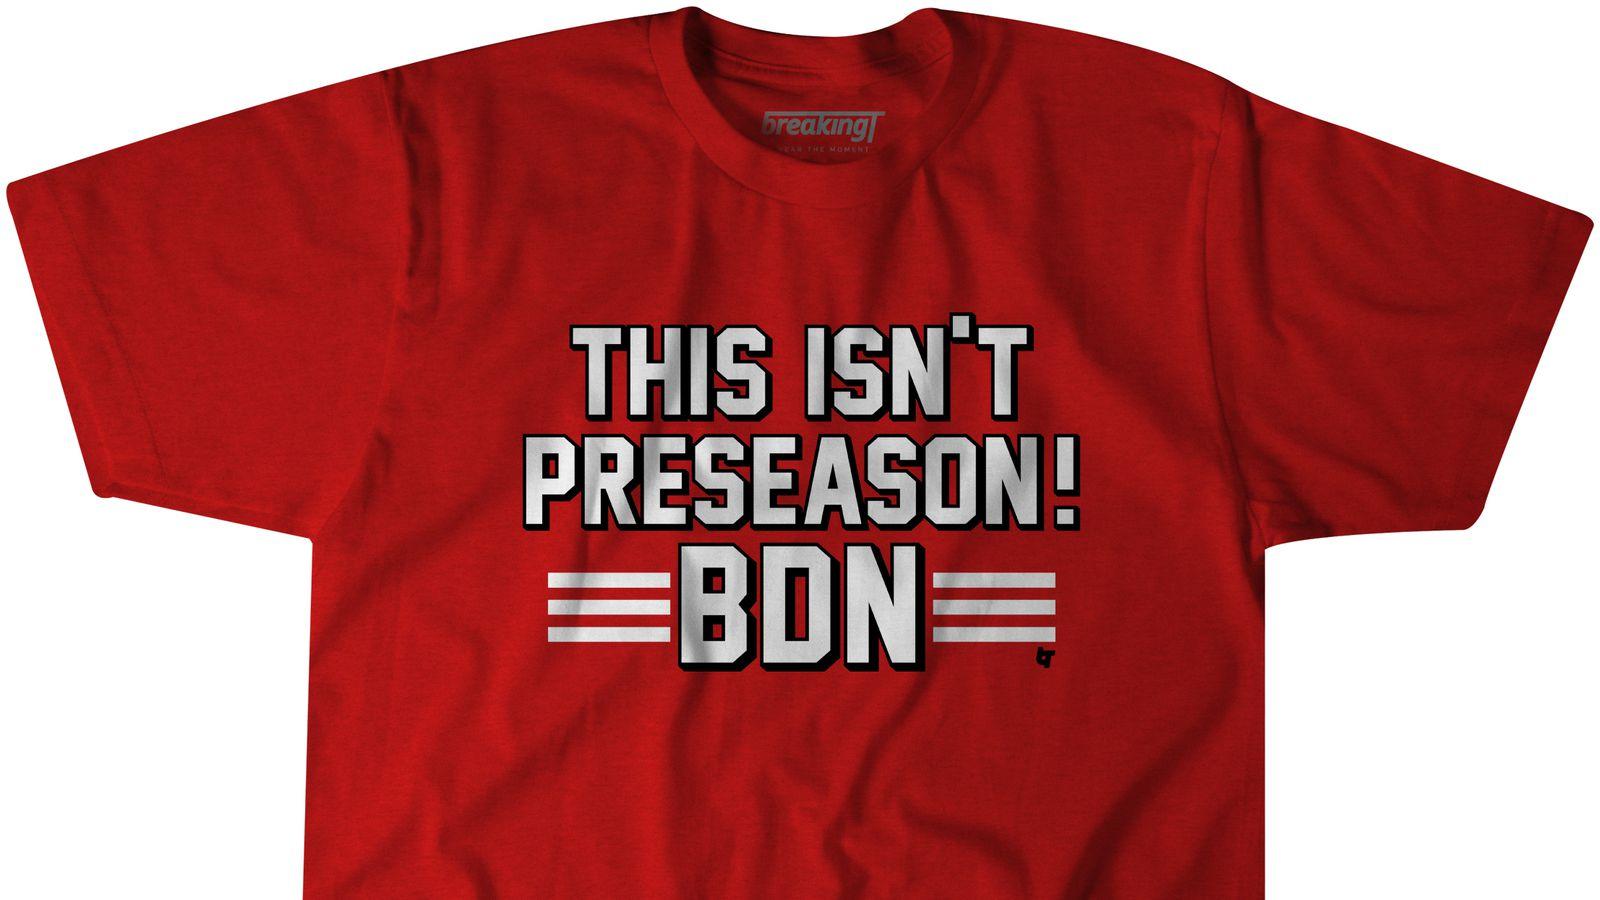 Bdn_breakingt_shirt.0